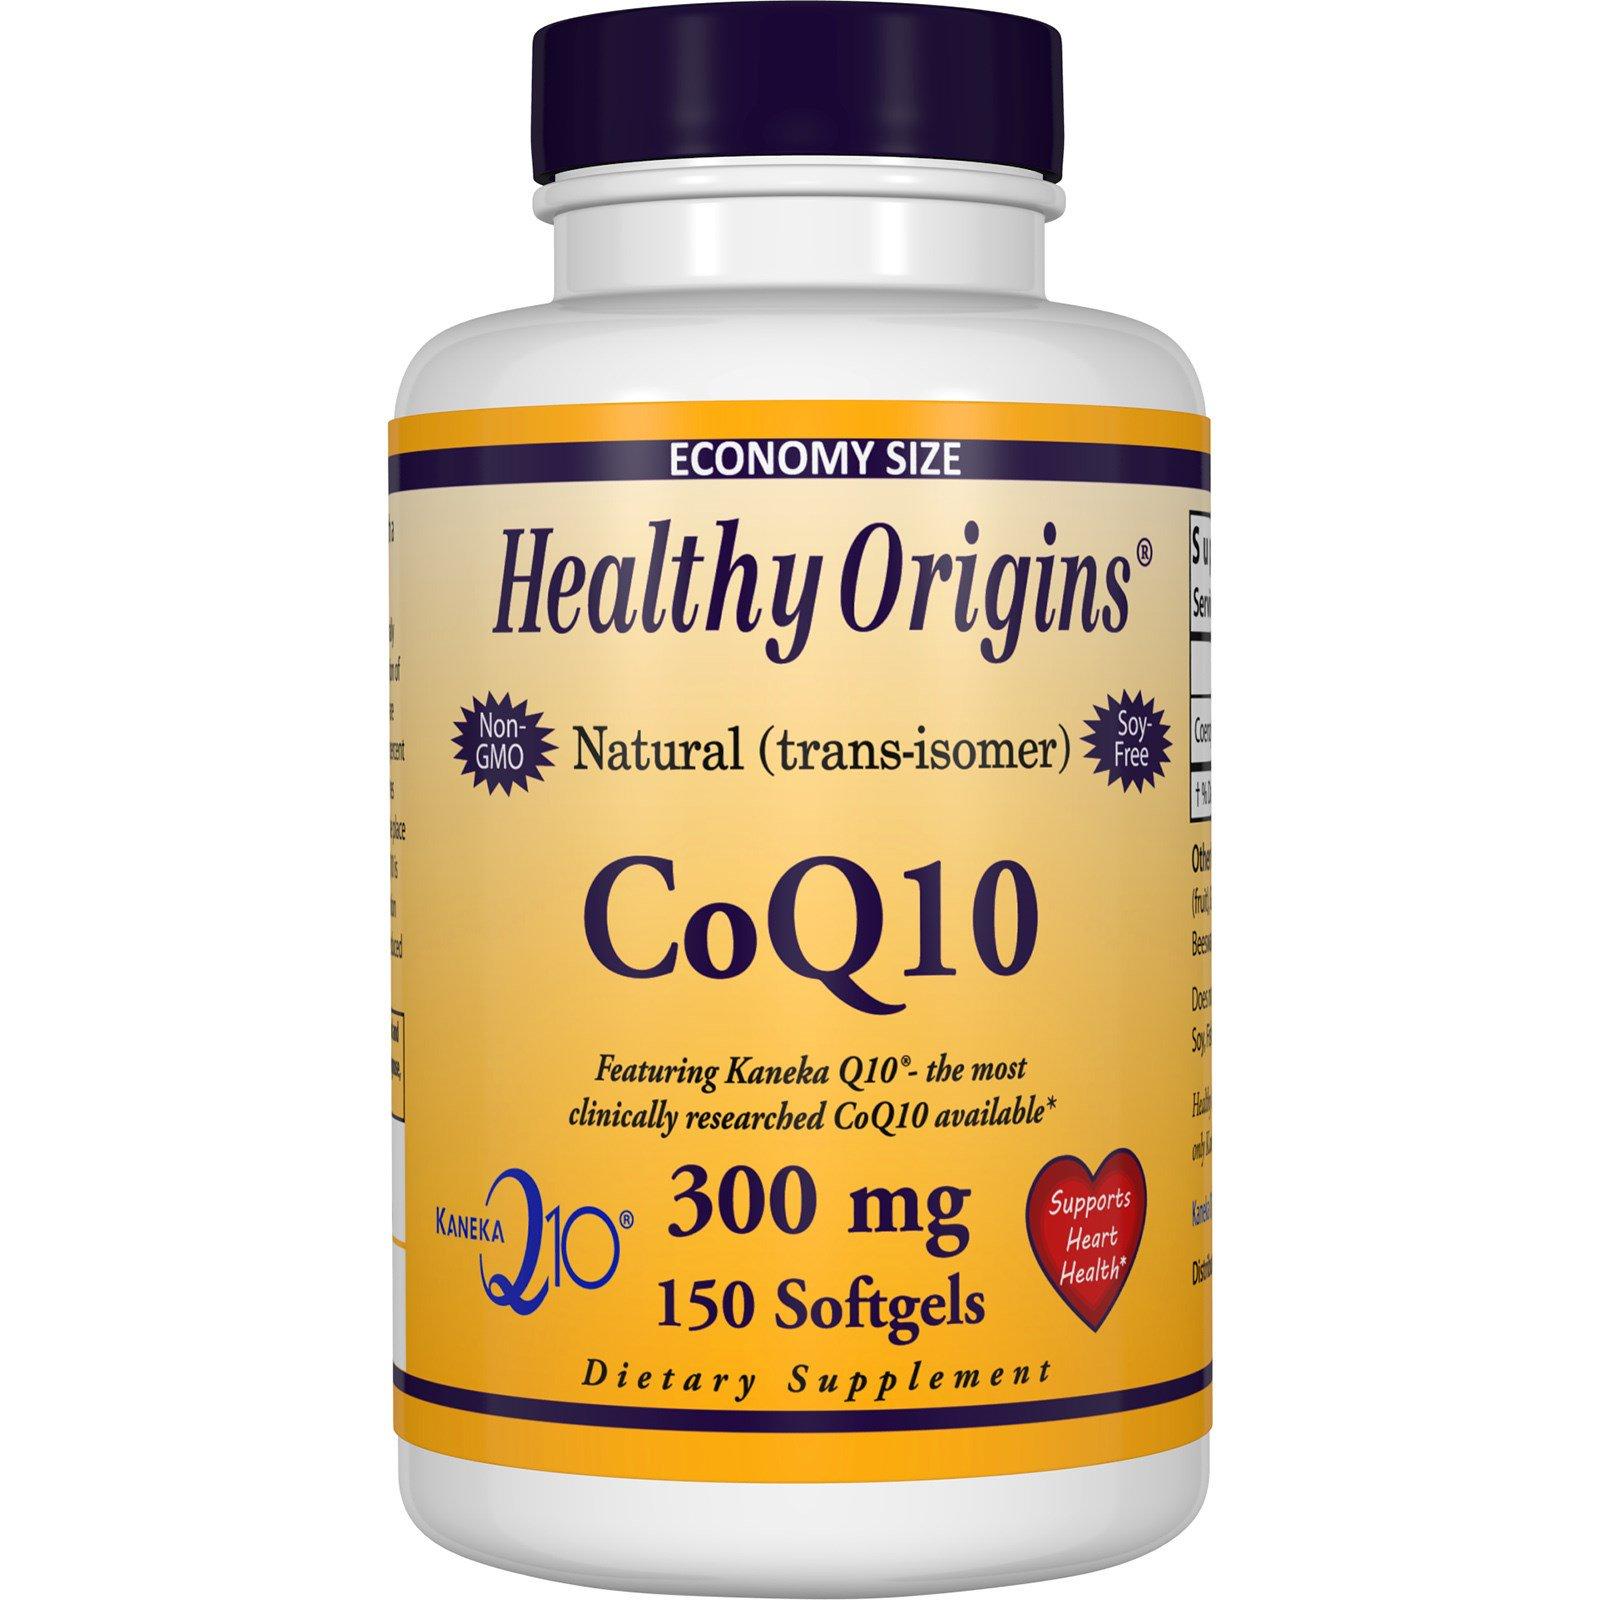 Healthy Origins, Гель коэнзим Q10 (Kaneka Q10), 300 mg, 150 гелевых капсул